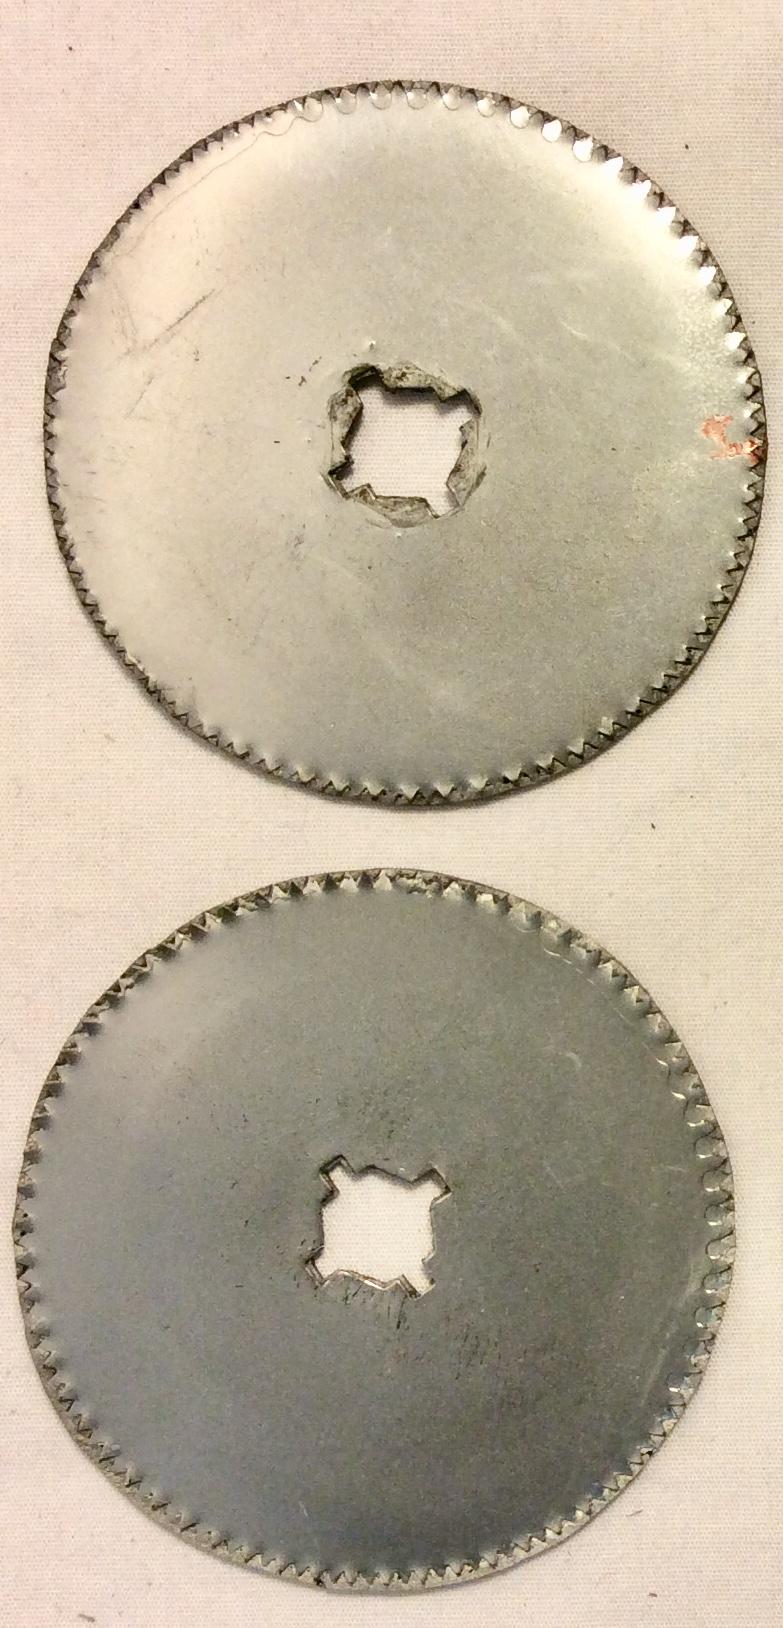 Rubber circular bone saw blade